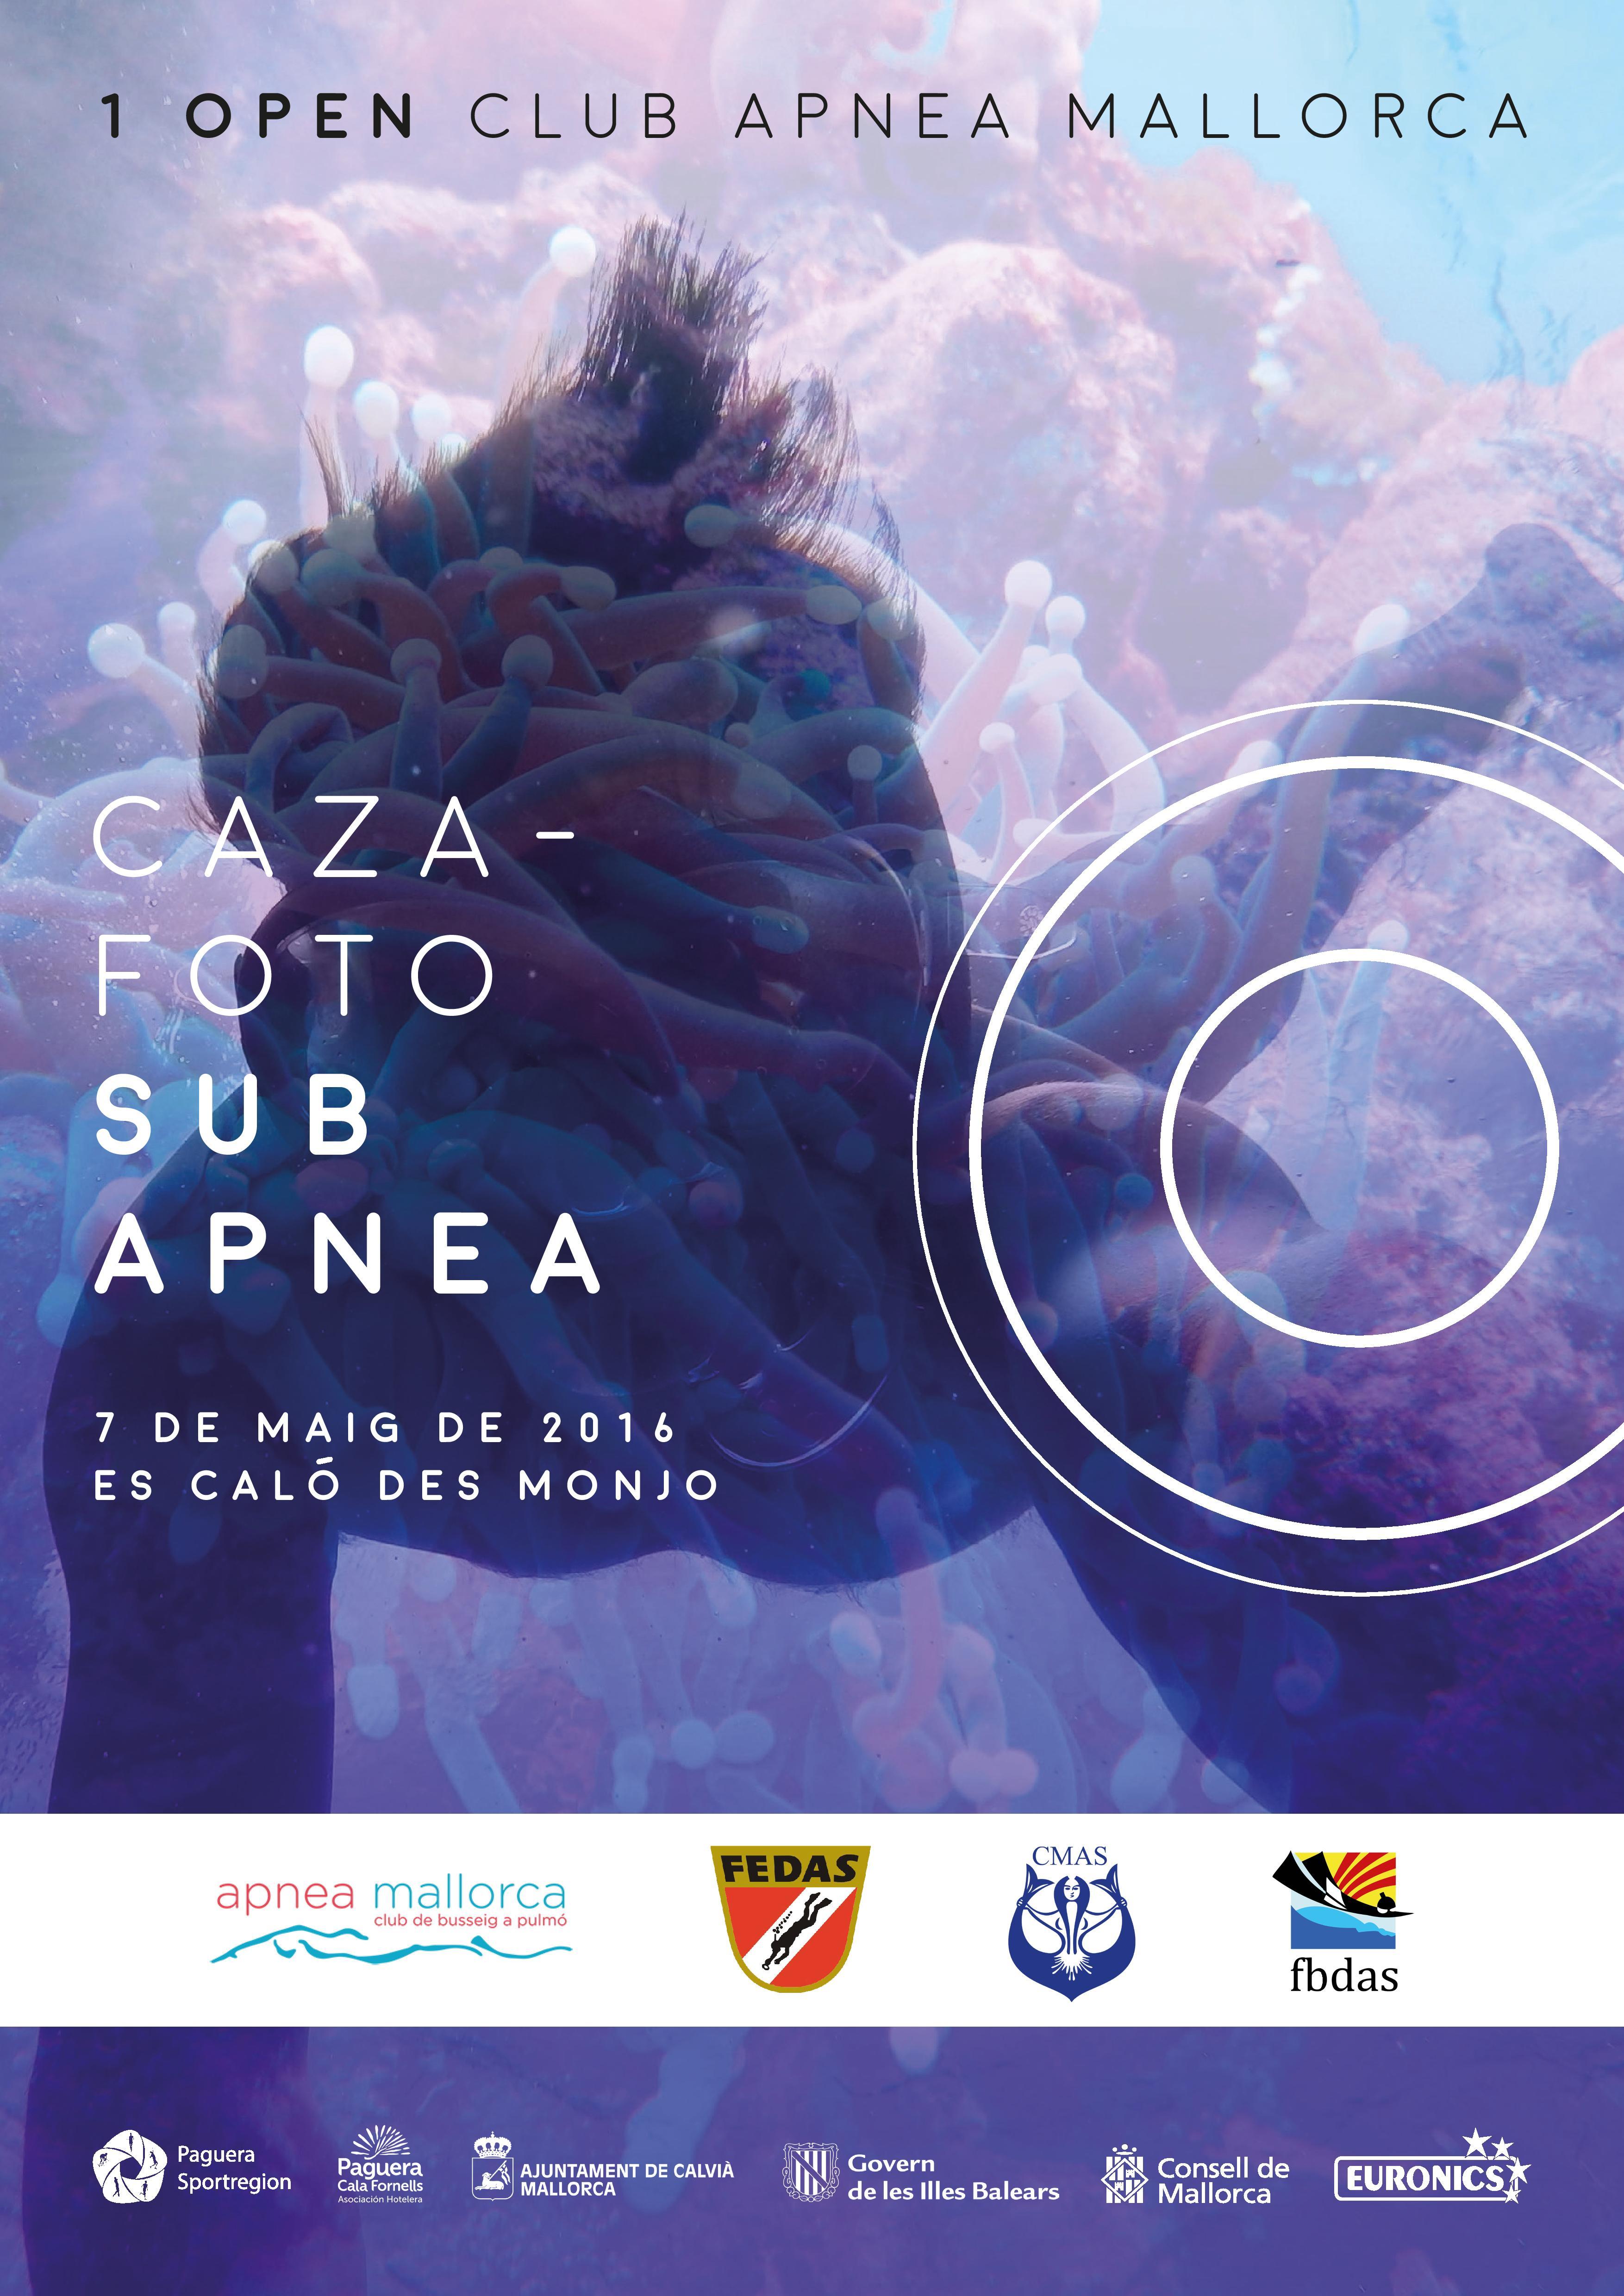 CAZAFOTOSUB APNEA, 1º Open Club Apnea Mallorca, 7 MAYO 2016